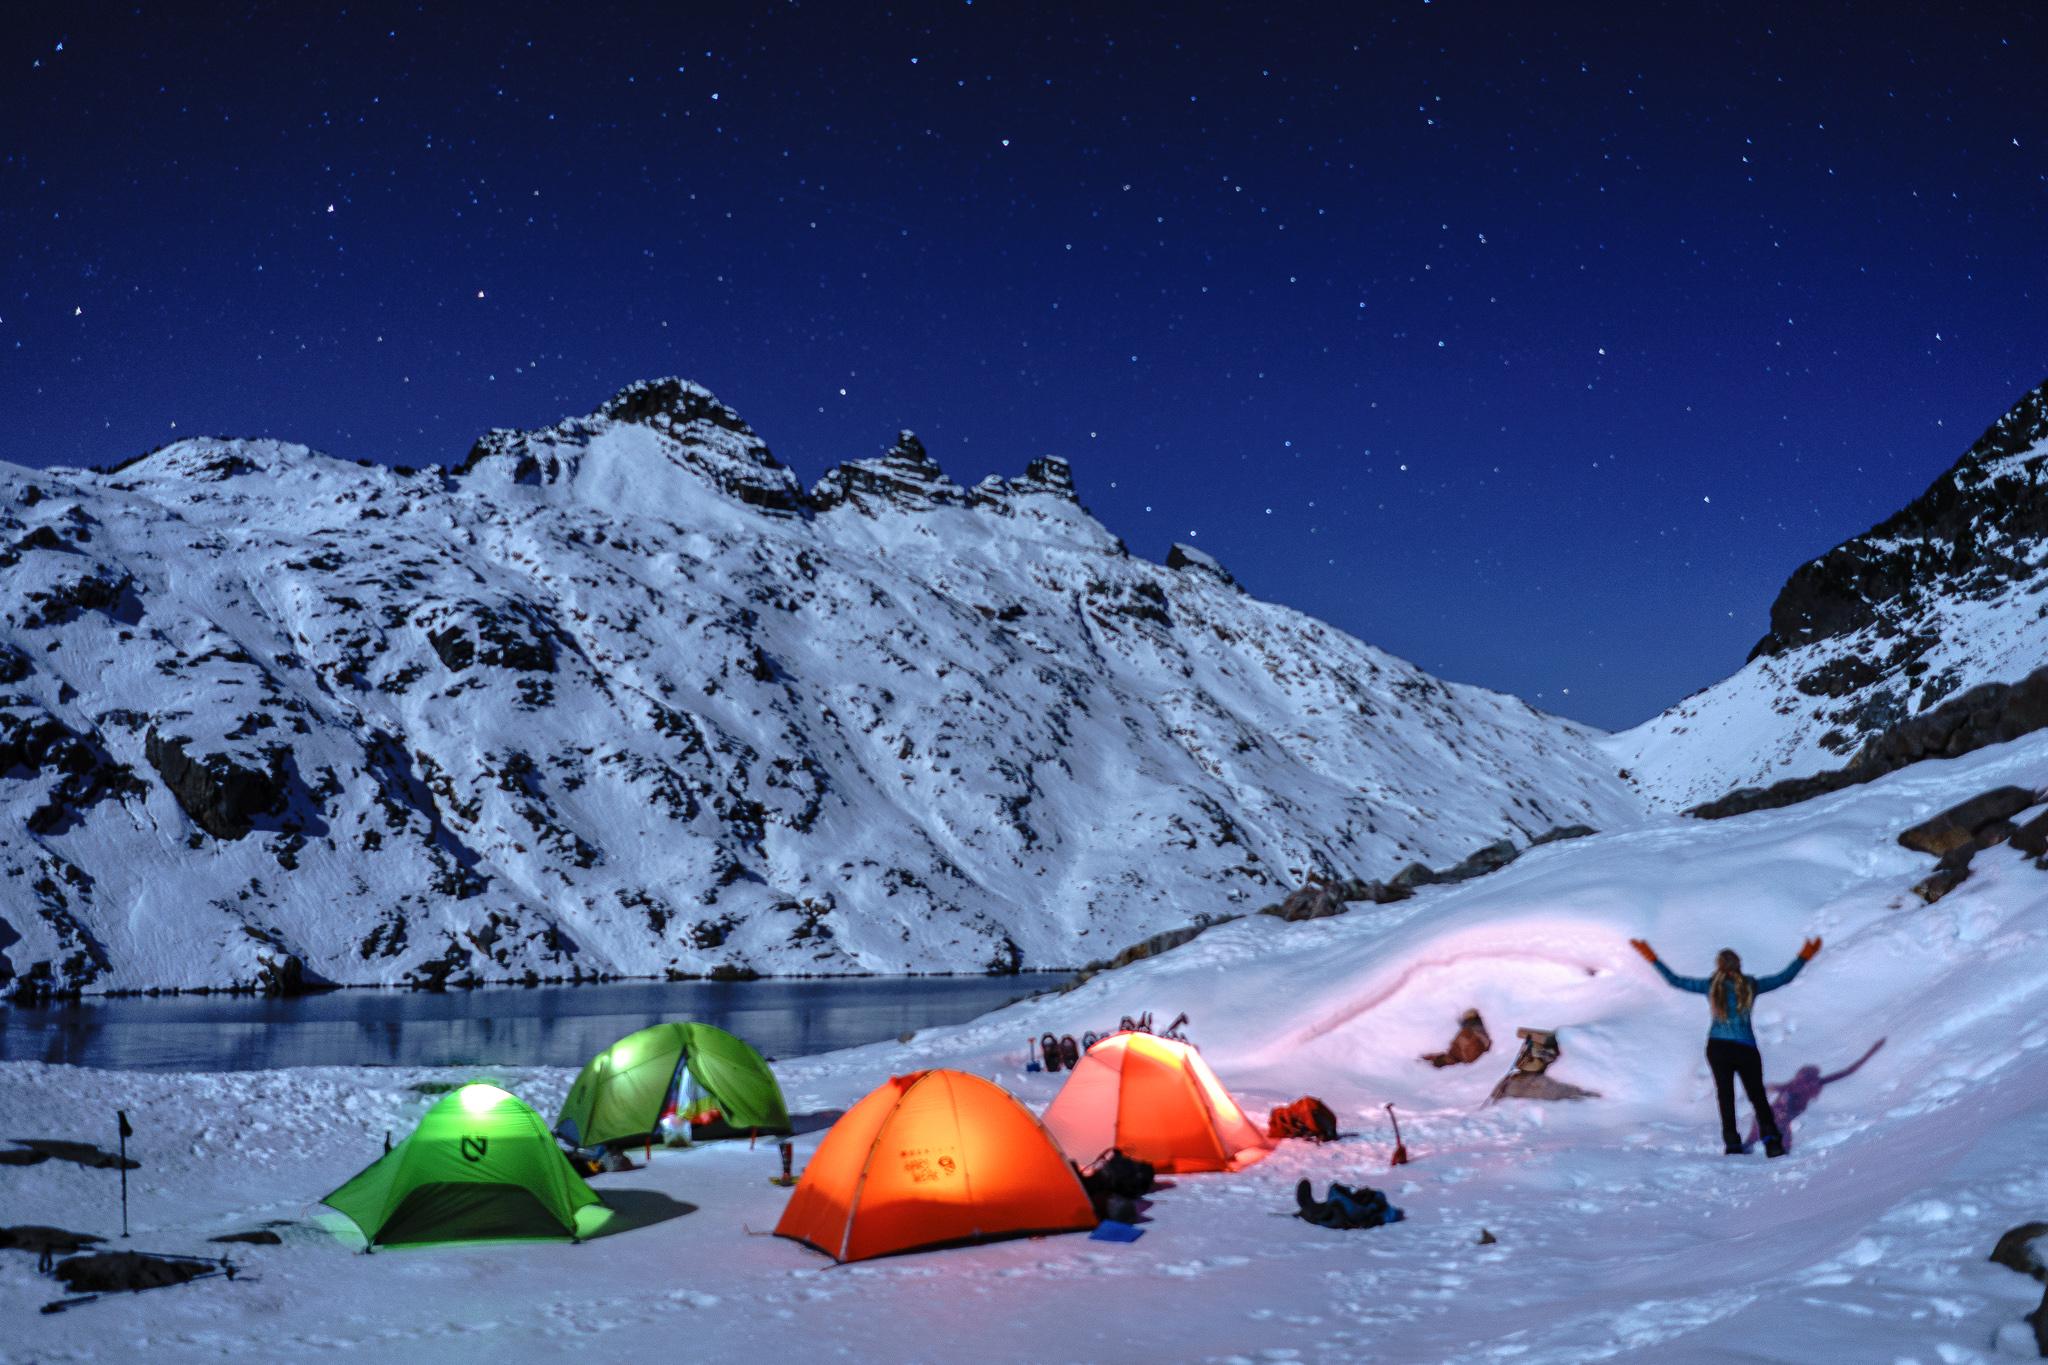 Lit up tents + night sky